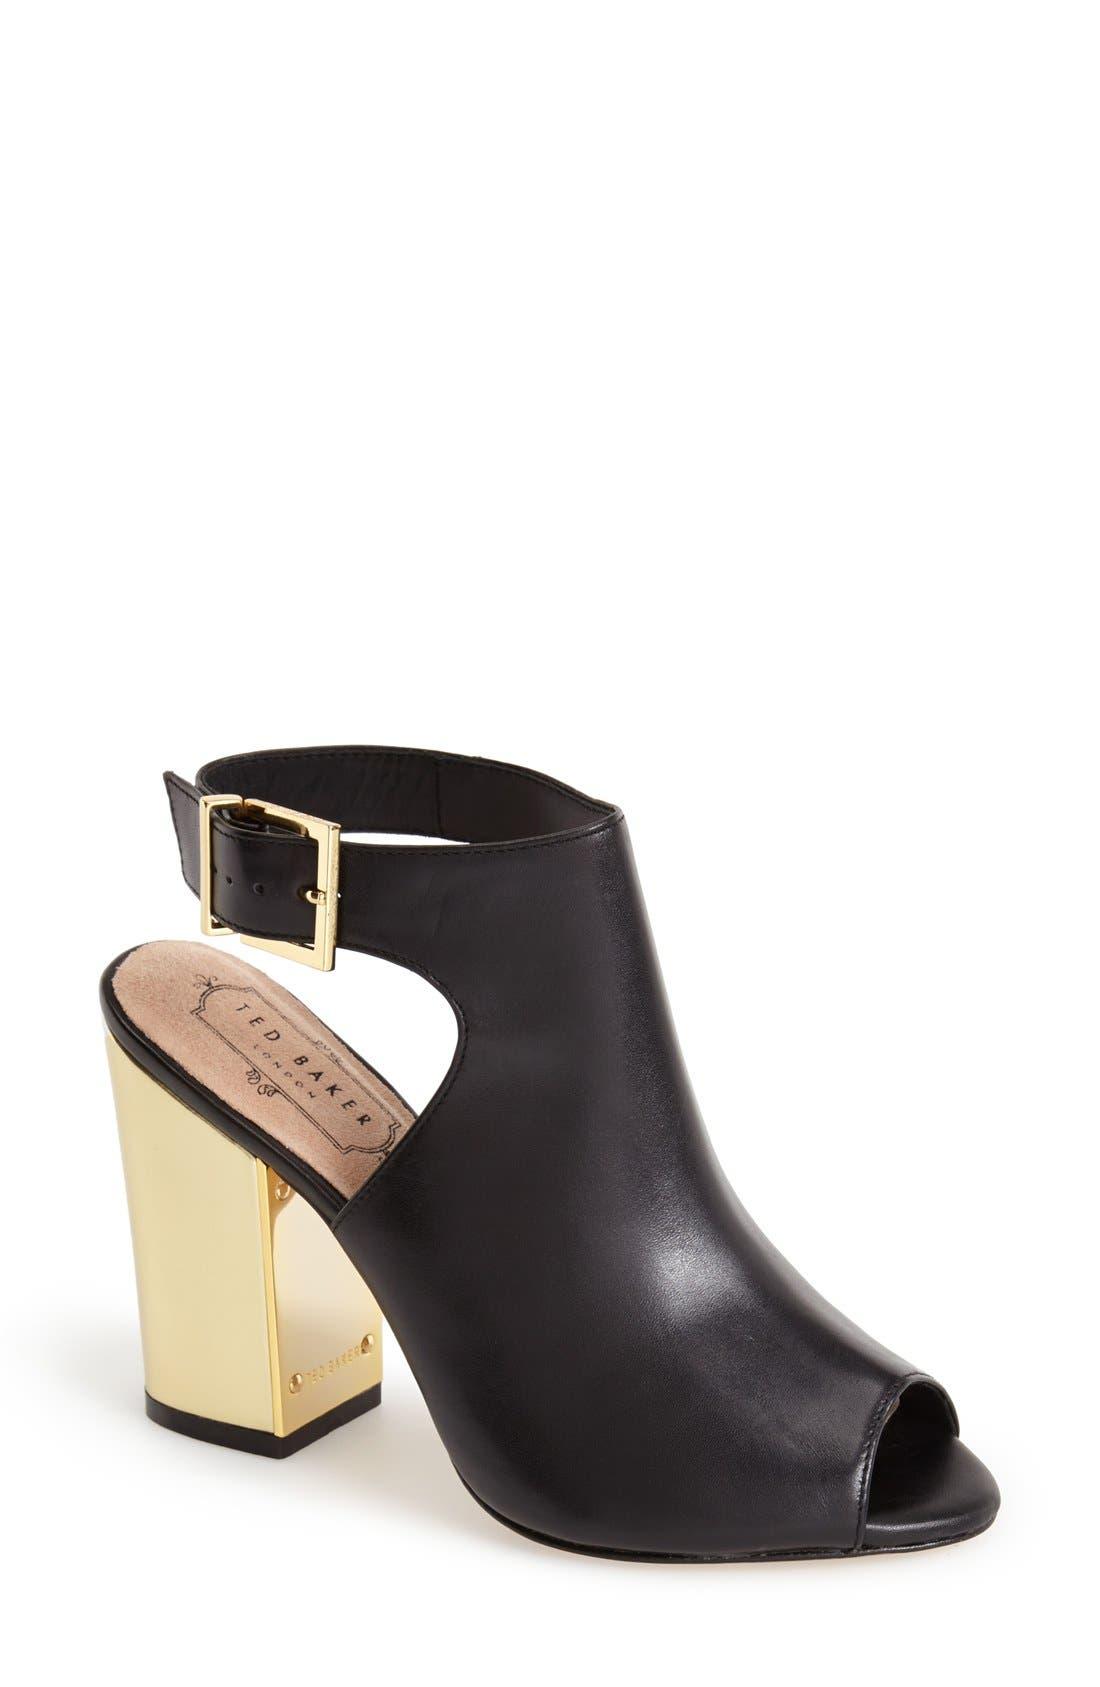 Alternate Image 1 Selected - Ted Baker London 'Montagny' Leather Sandal (Women)